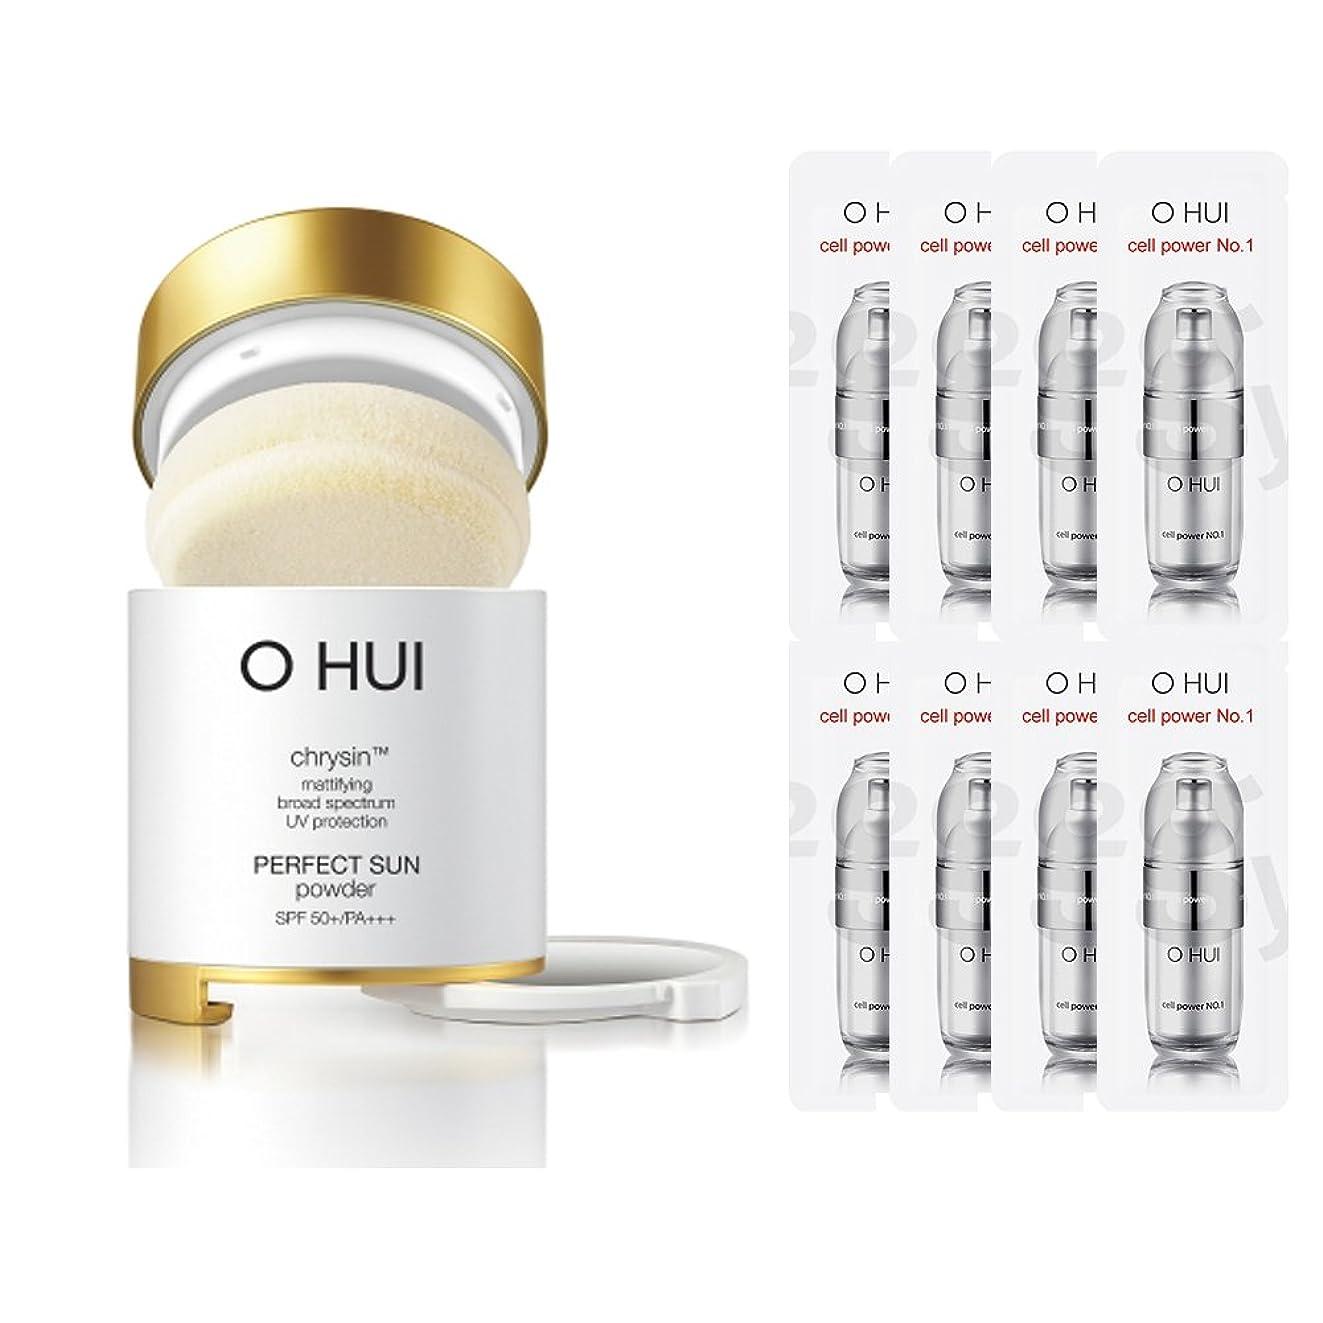 OHUI/オフィ2015年 パーフェクトサンパウダー (OHUI Version Perfect Sun Powder SPF50++PA+++ Special Gift set) スポット [海外直送品] (2号ベージュ)